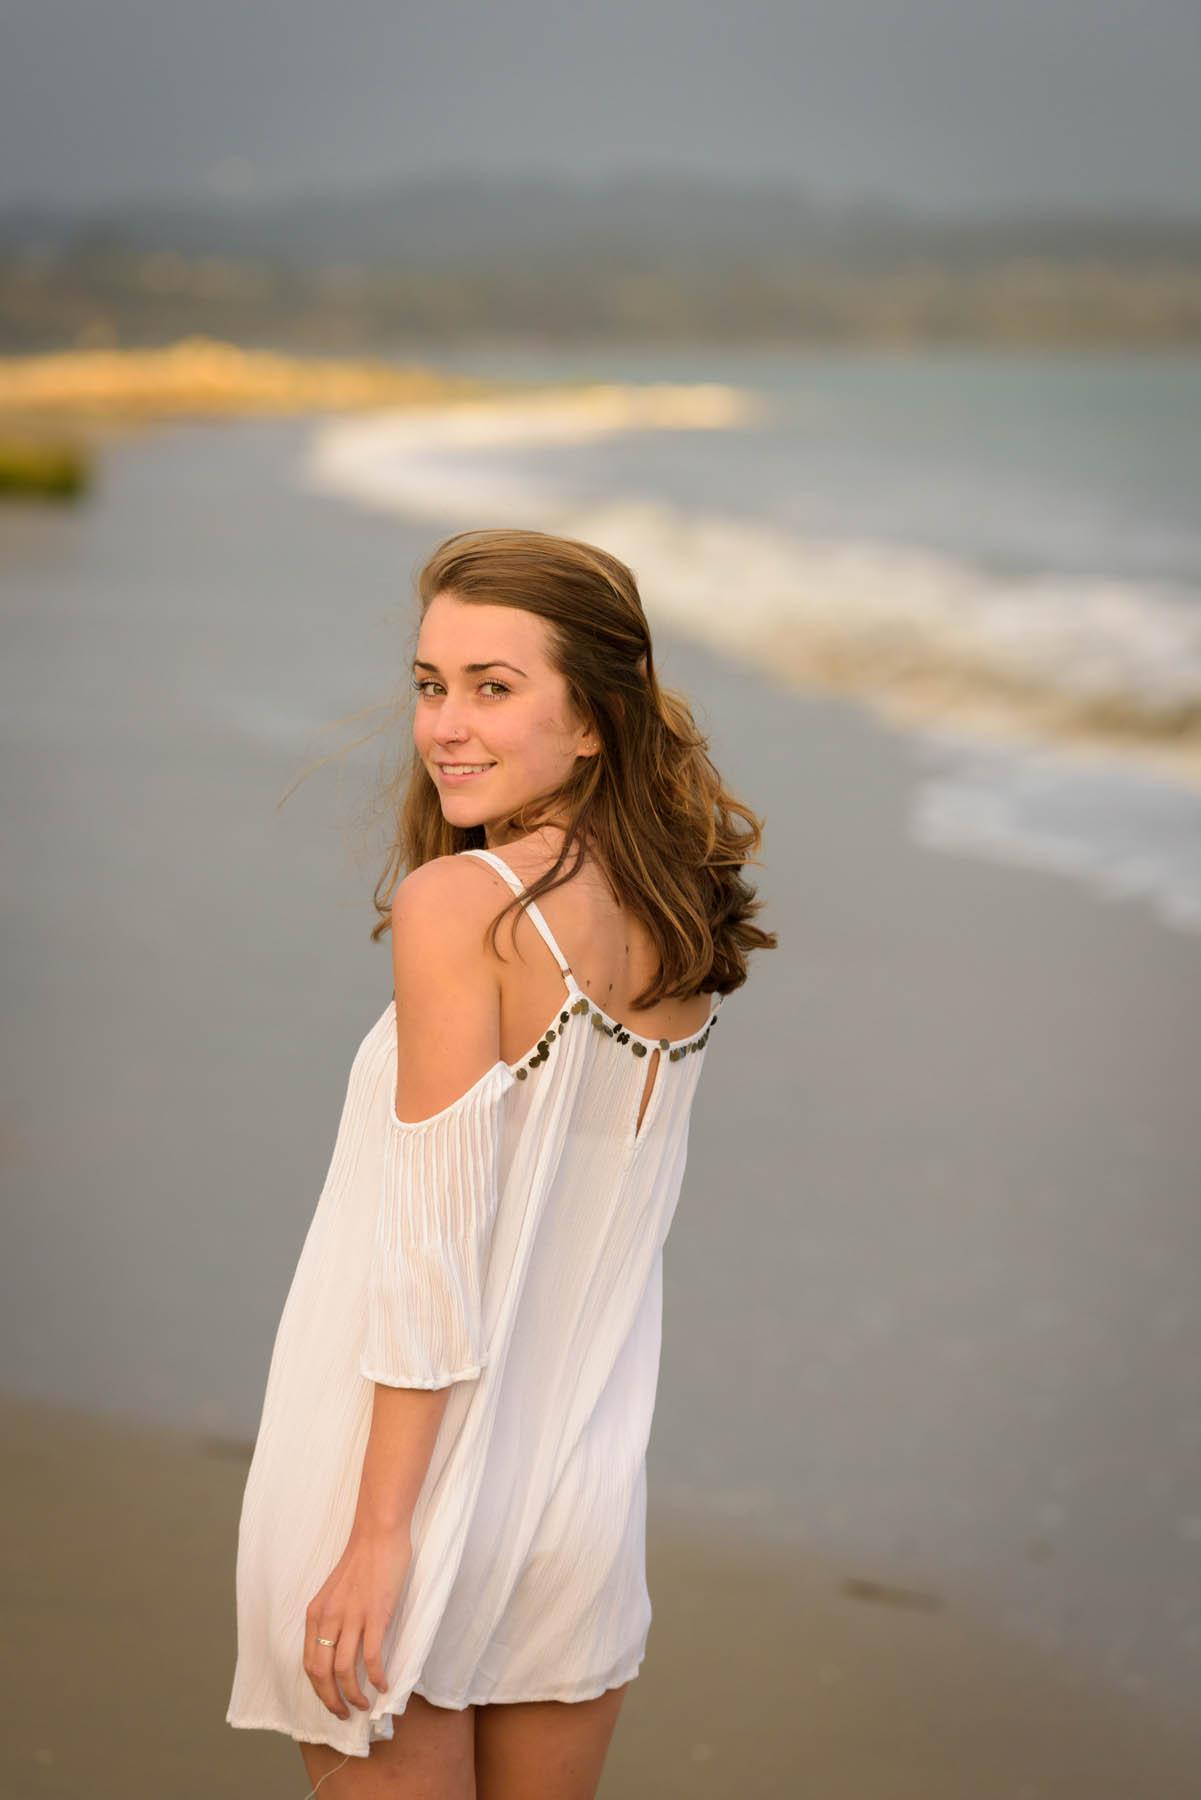 7922_Morgan_Capitola_Beach_Senior_Portrait_Photography.jpg